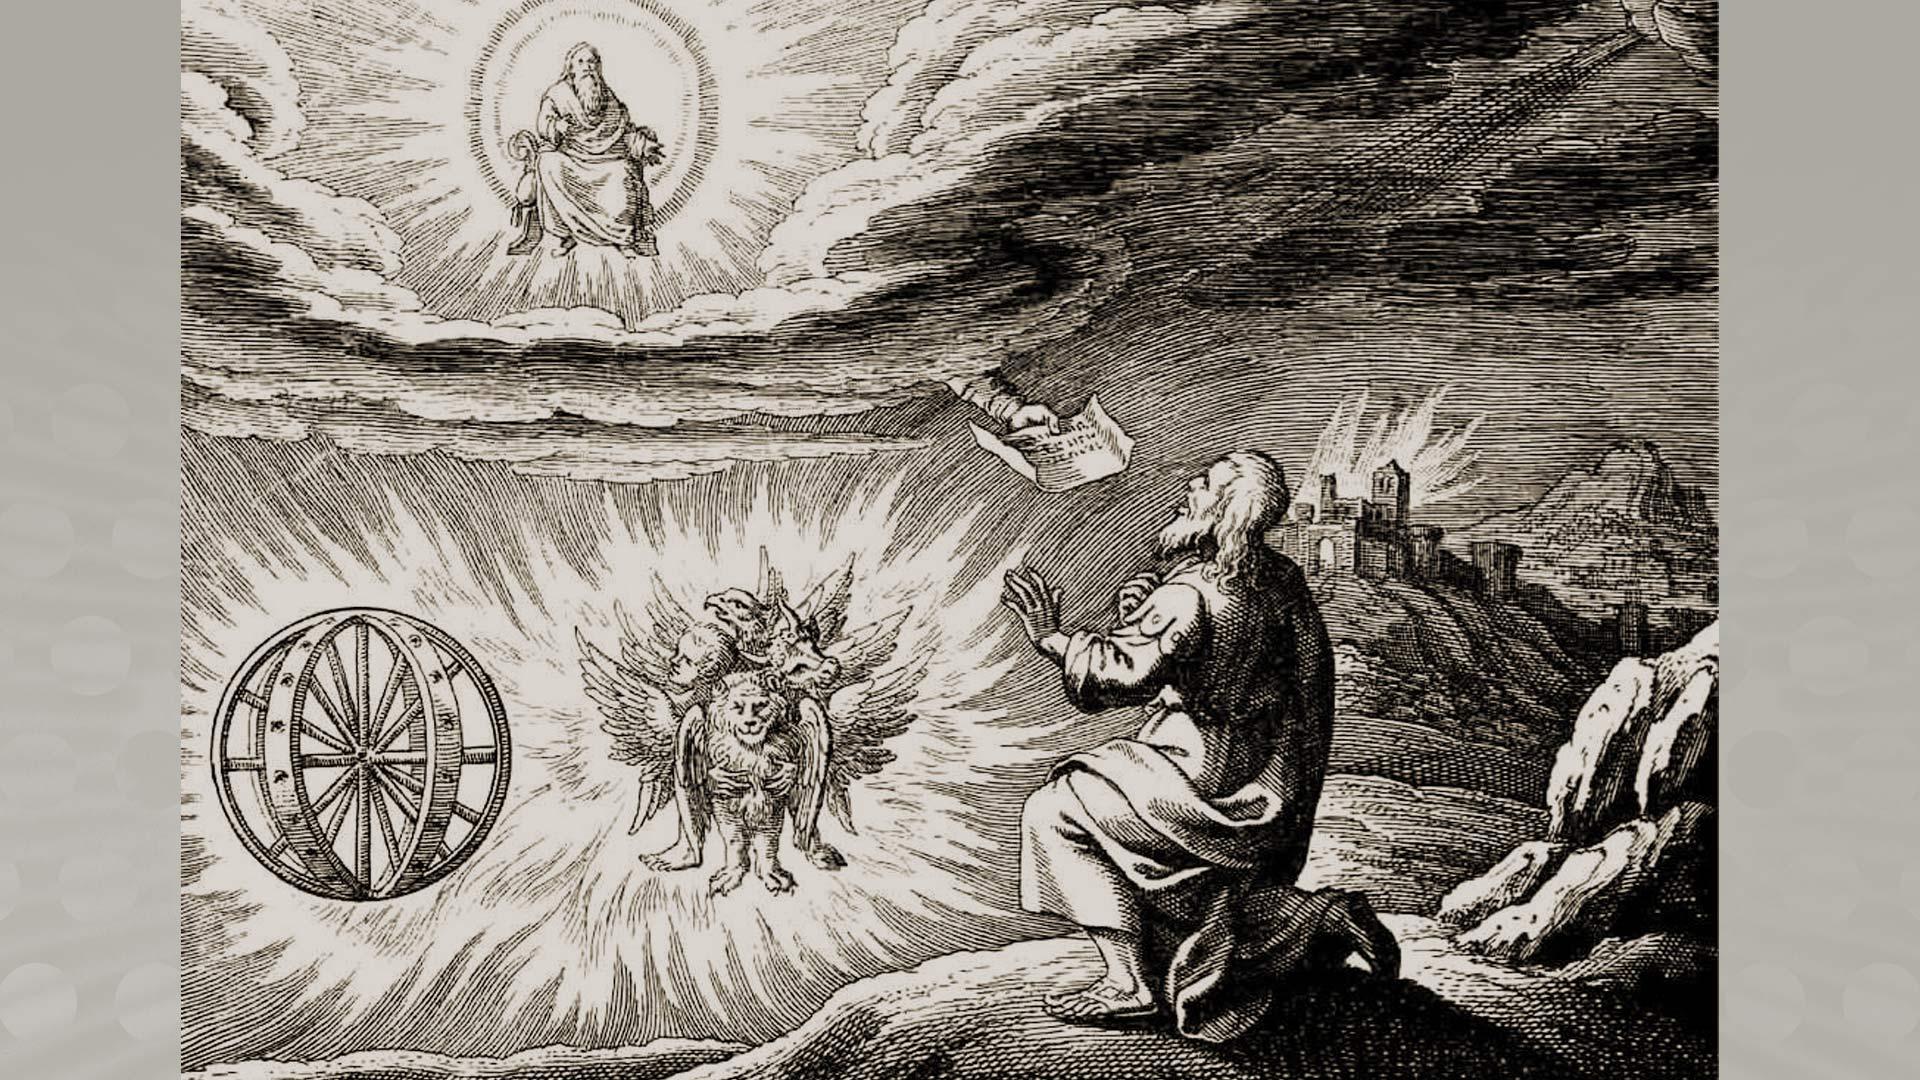 Ezekiels vision